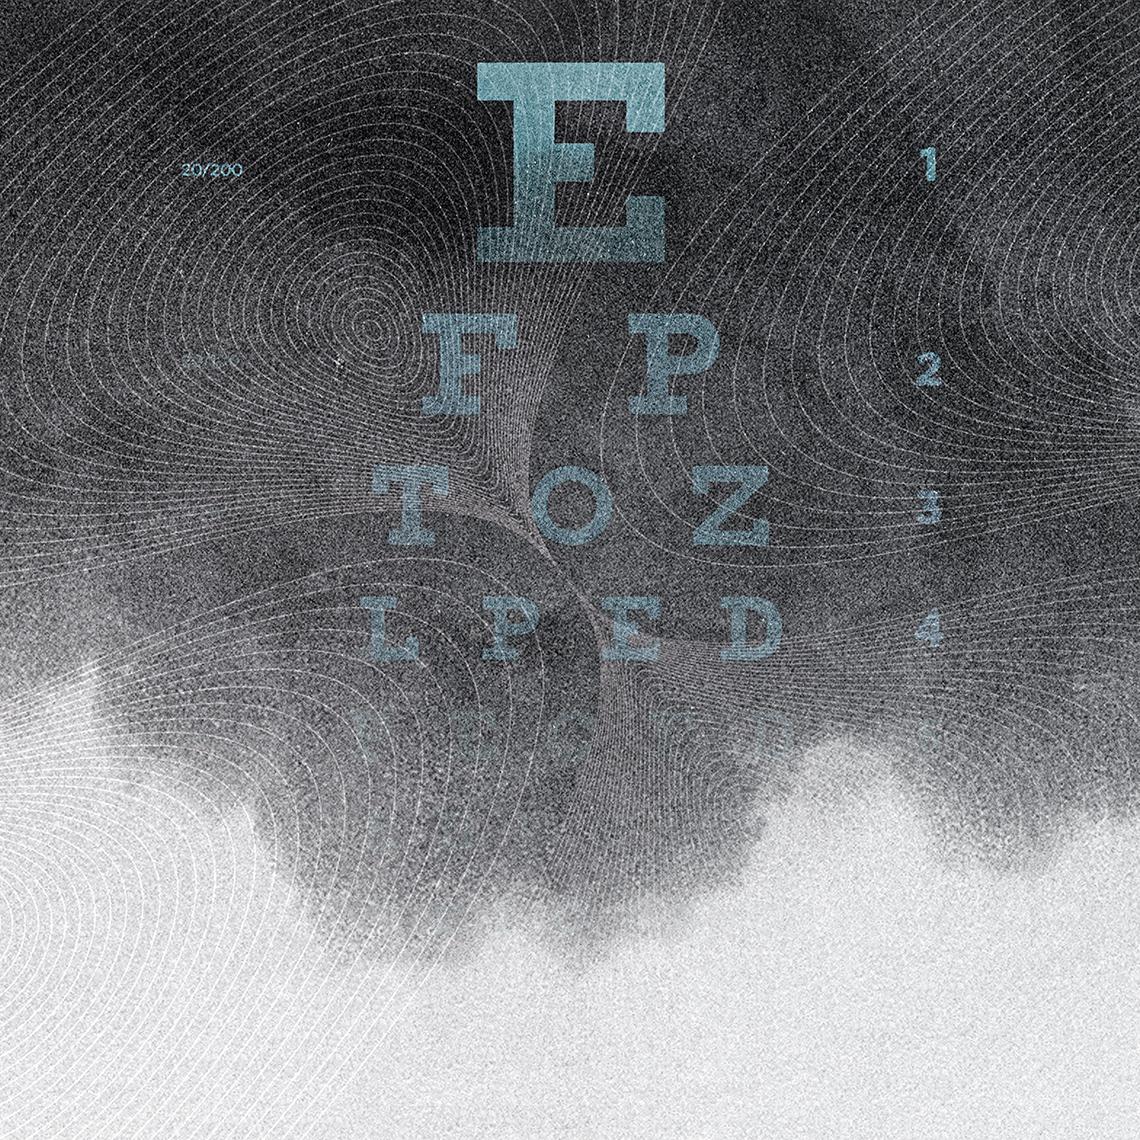 An illustration of a cloudy eye chart